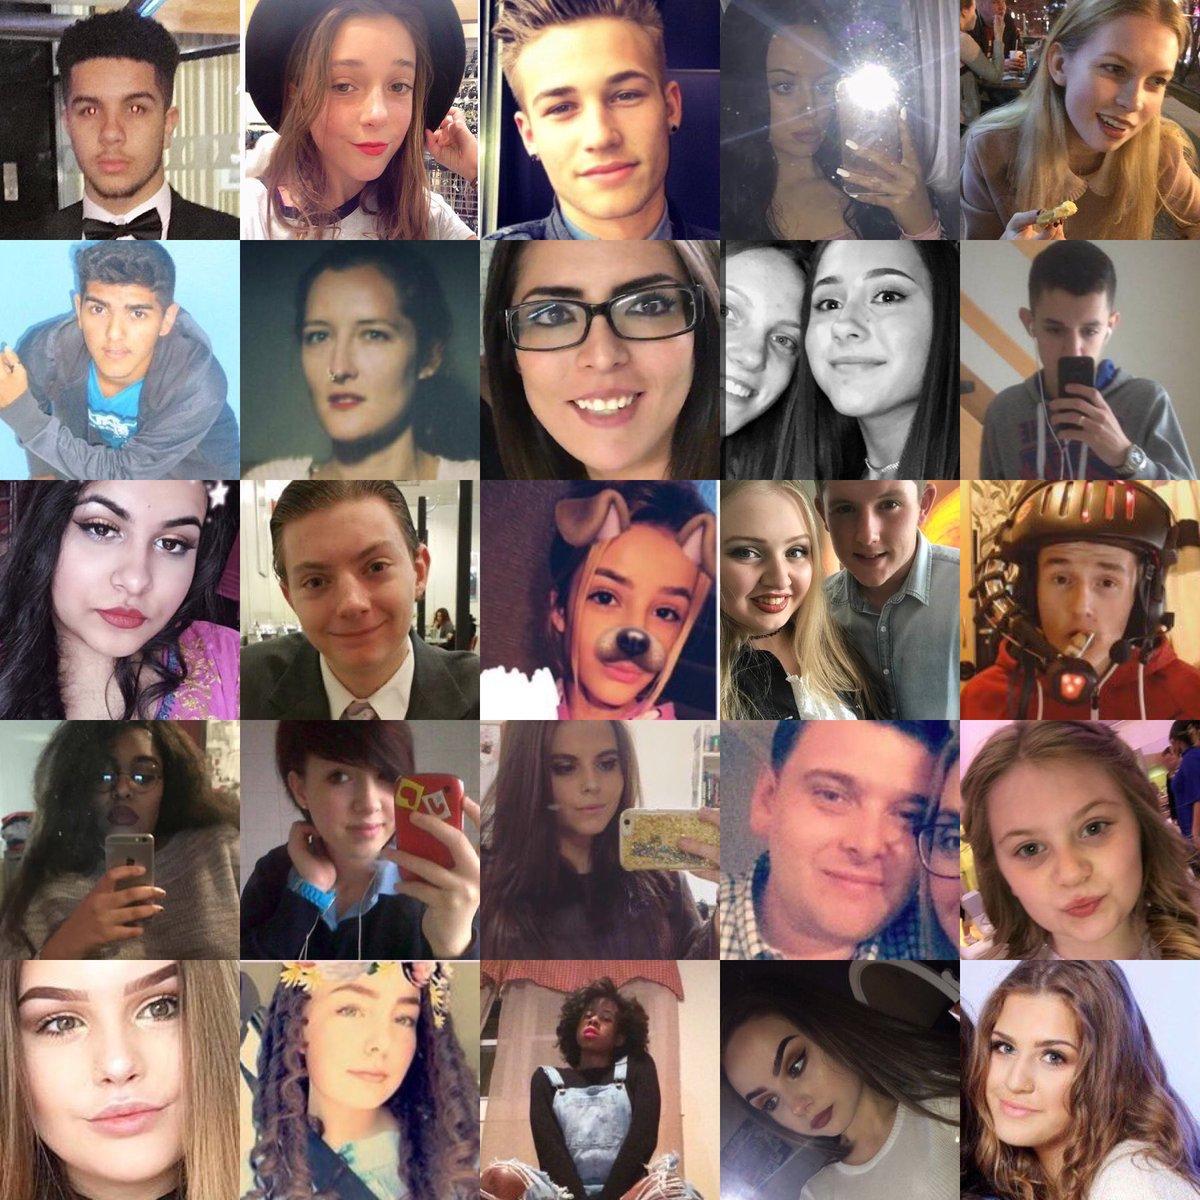 #SonDakika #Breaking MISSING IN MANCHESTER  #ManchesterArena #England #Manchester #explosion  #İngiltere #Kayıp #ArianaGRANDE #Bomb #Concert<br>http://pic.twitter.com/yTApsLTCHt